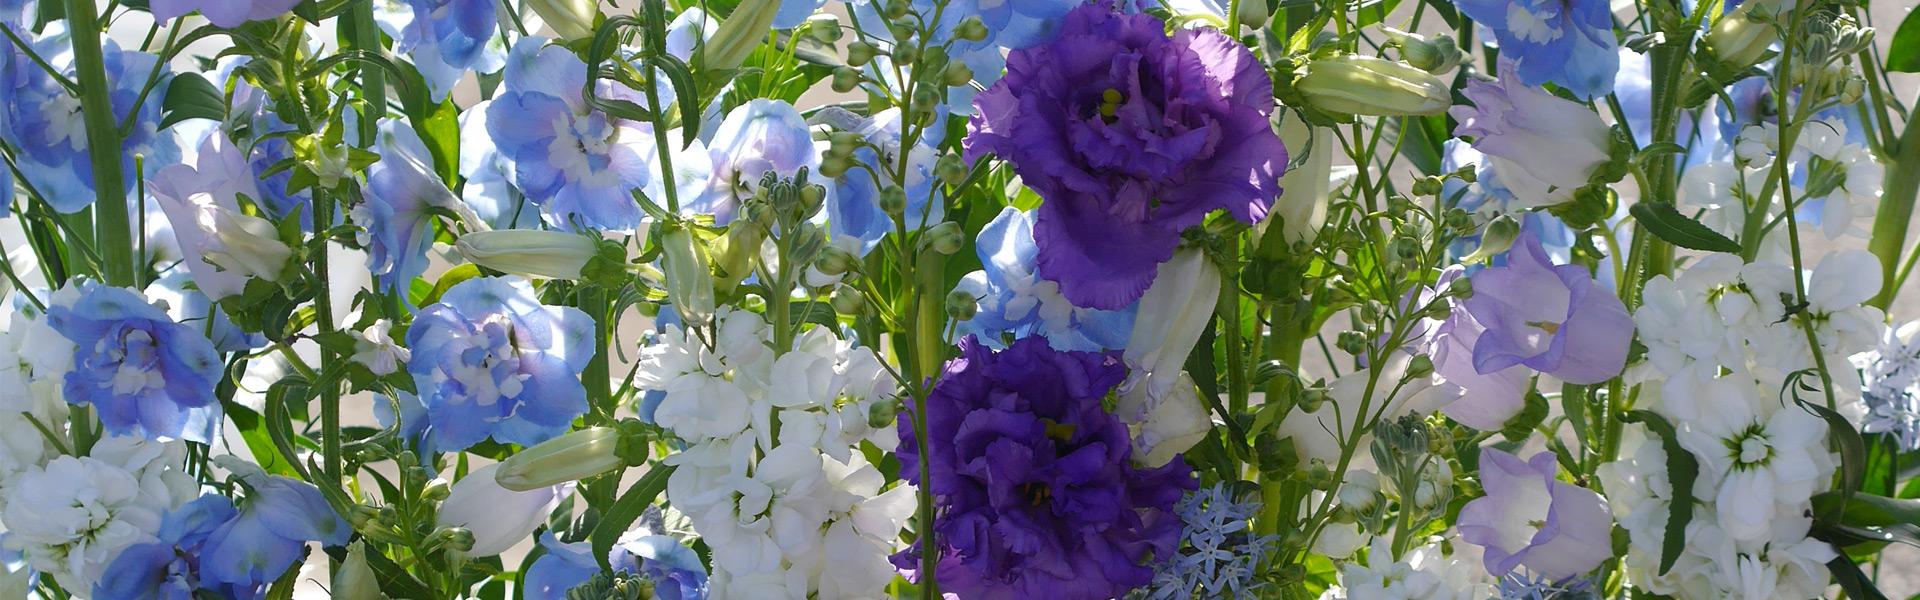 symphaty_flowers